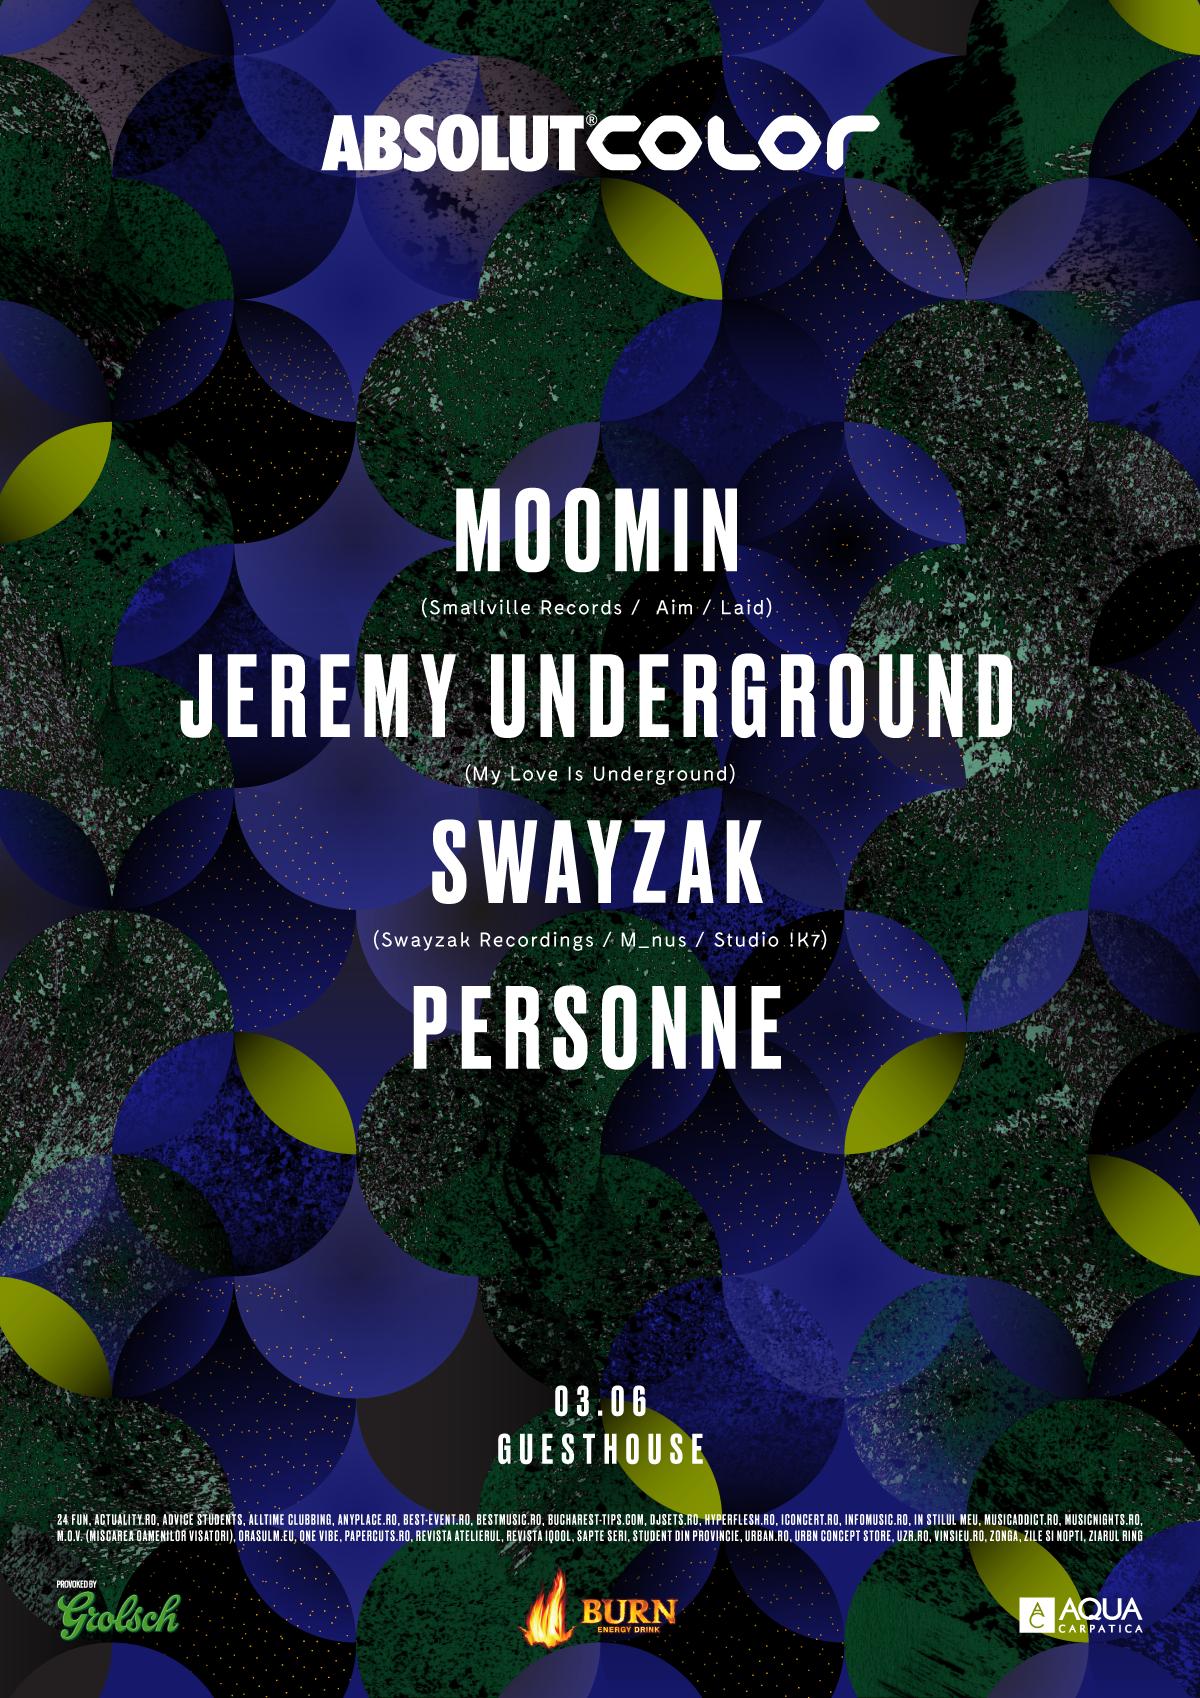 ABSOLUT COLOR prezintă Moomin, Jeremy Underground, Swayzak și Personne